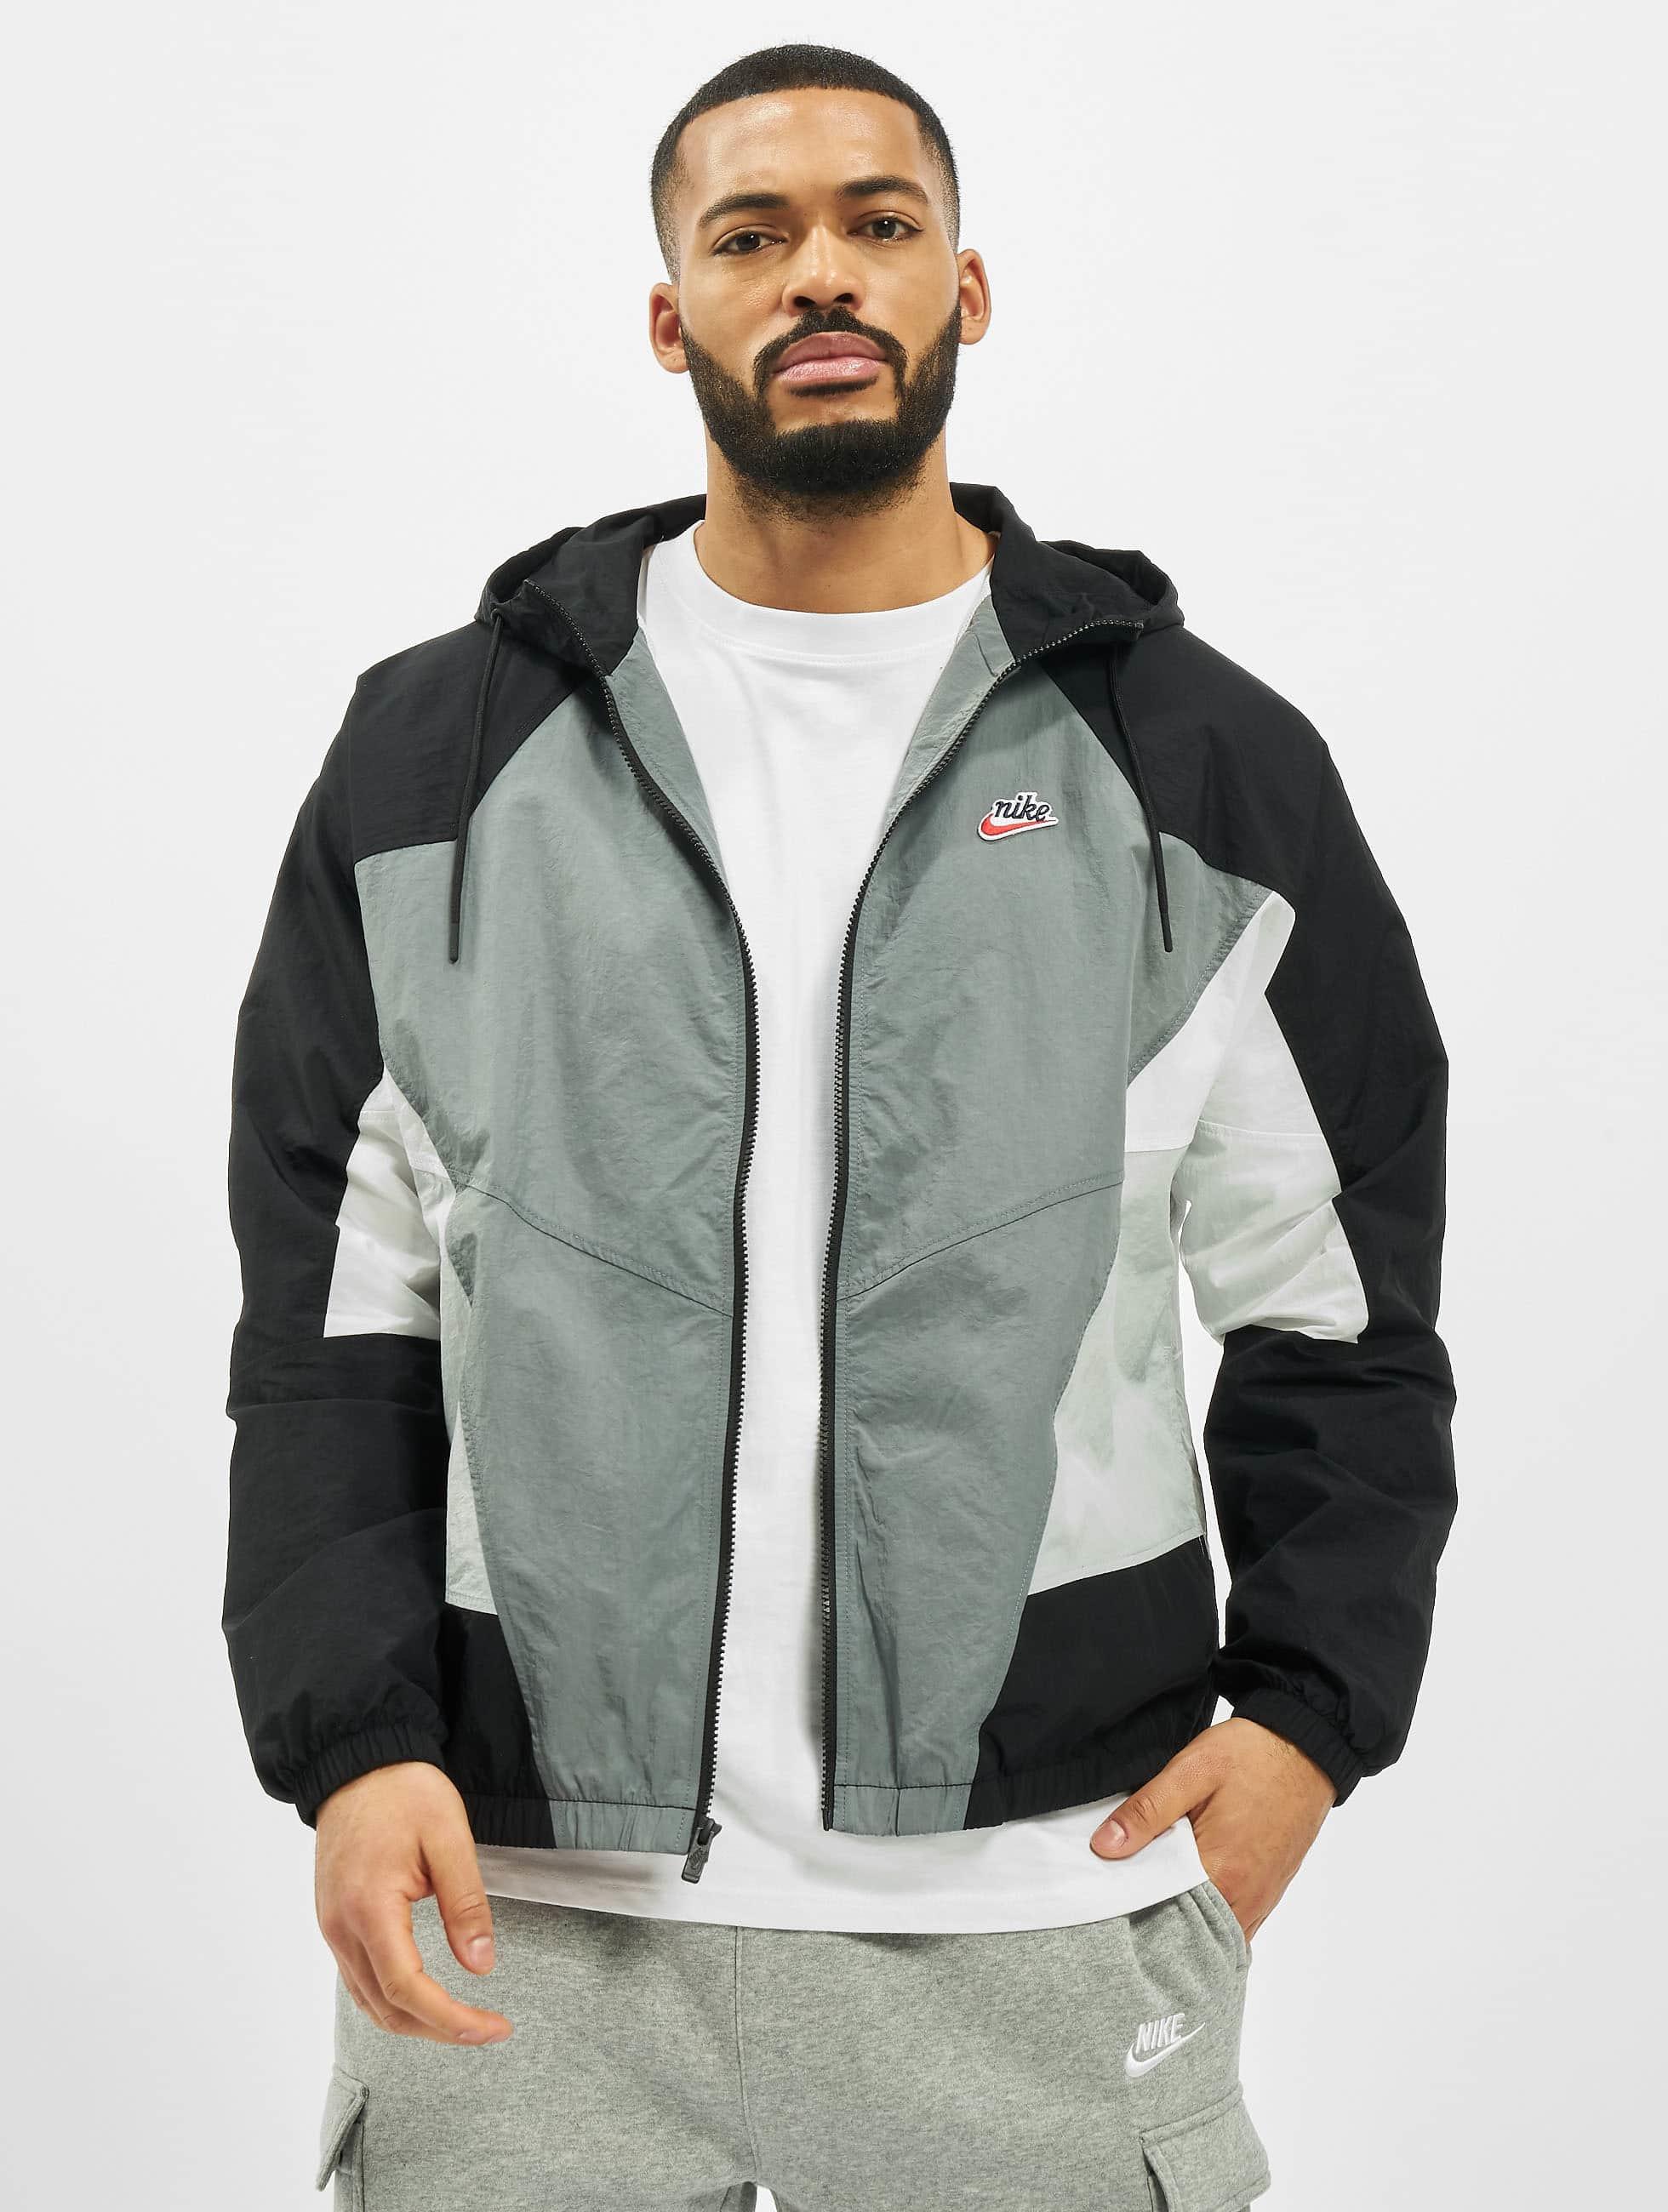 Nike Woven Signature Windrunner Jacket Smoke GreyBlackLt Smoke Grey